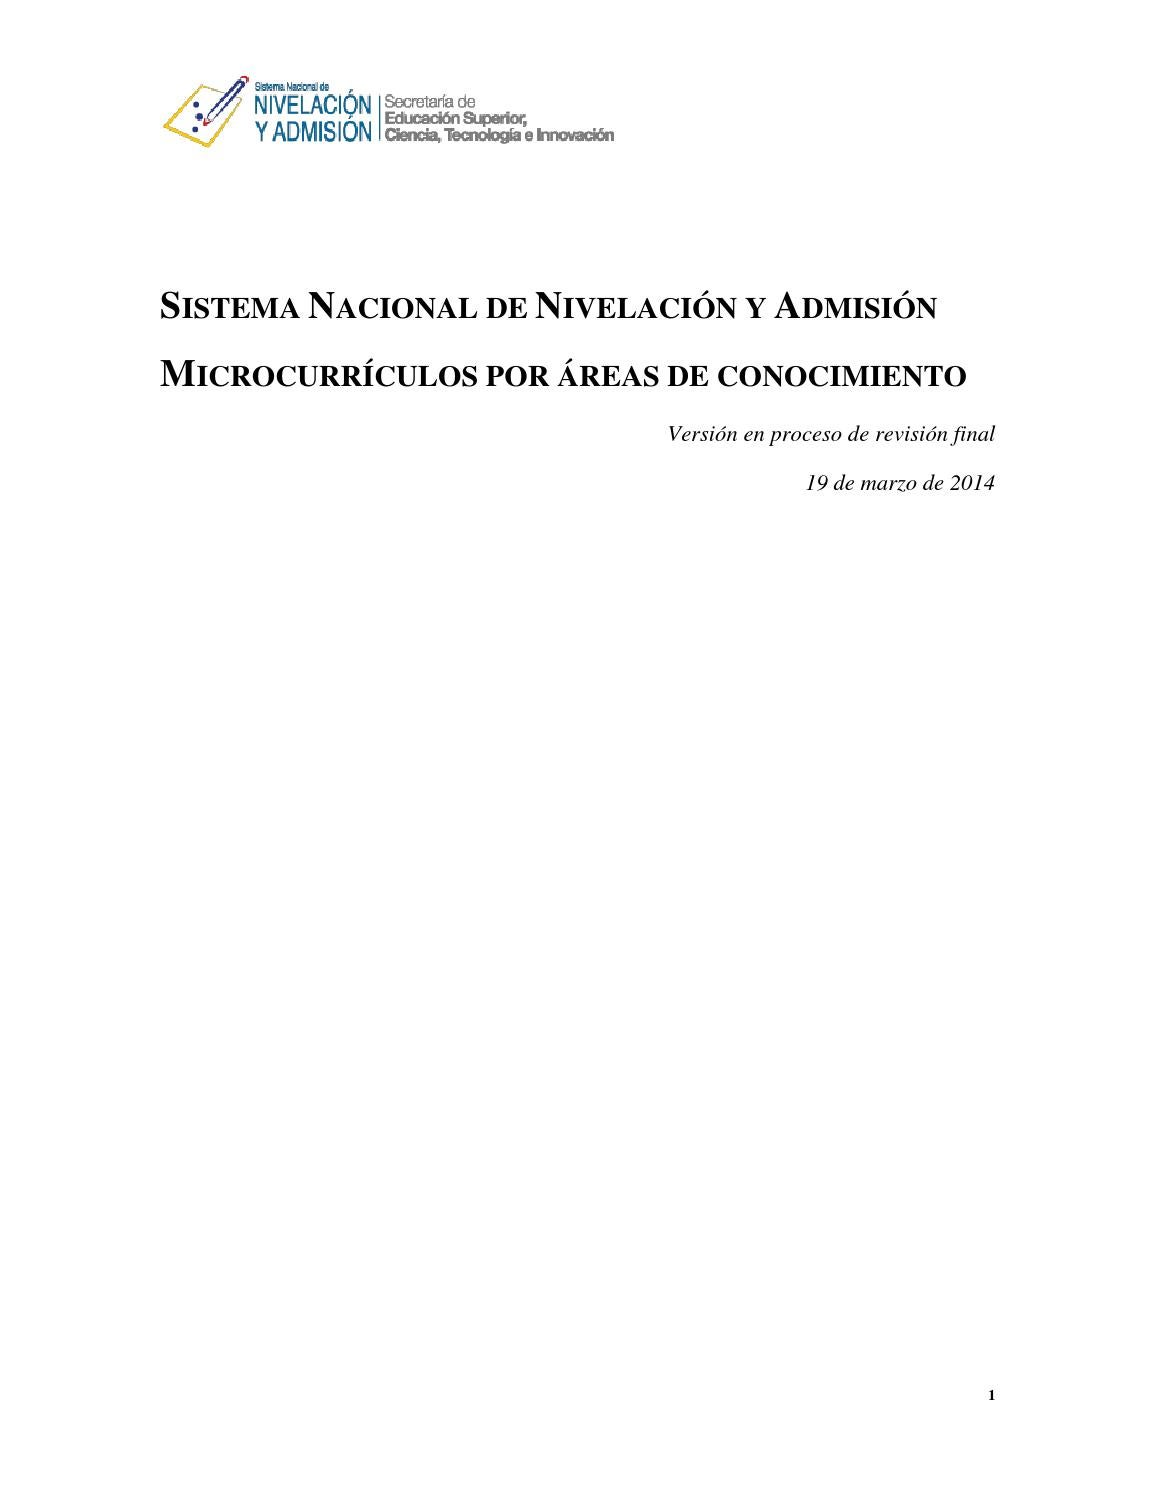 Microcurriculo de anatomia nuevo by Oscar Carpio - issuu